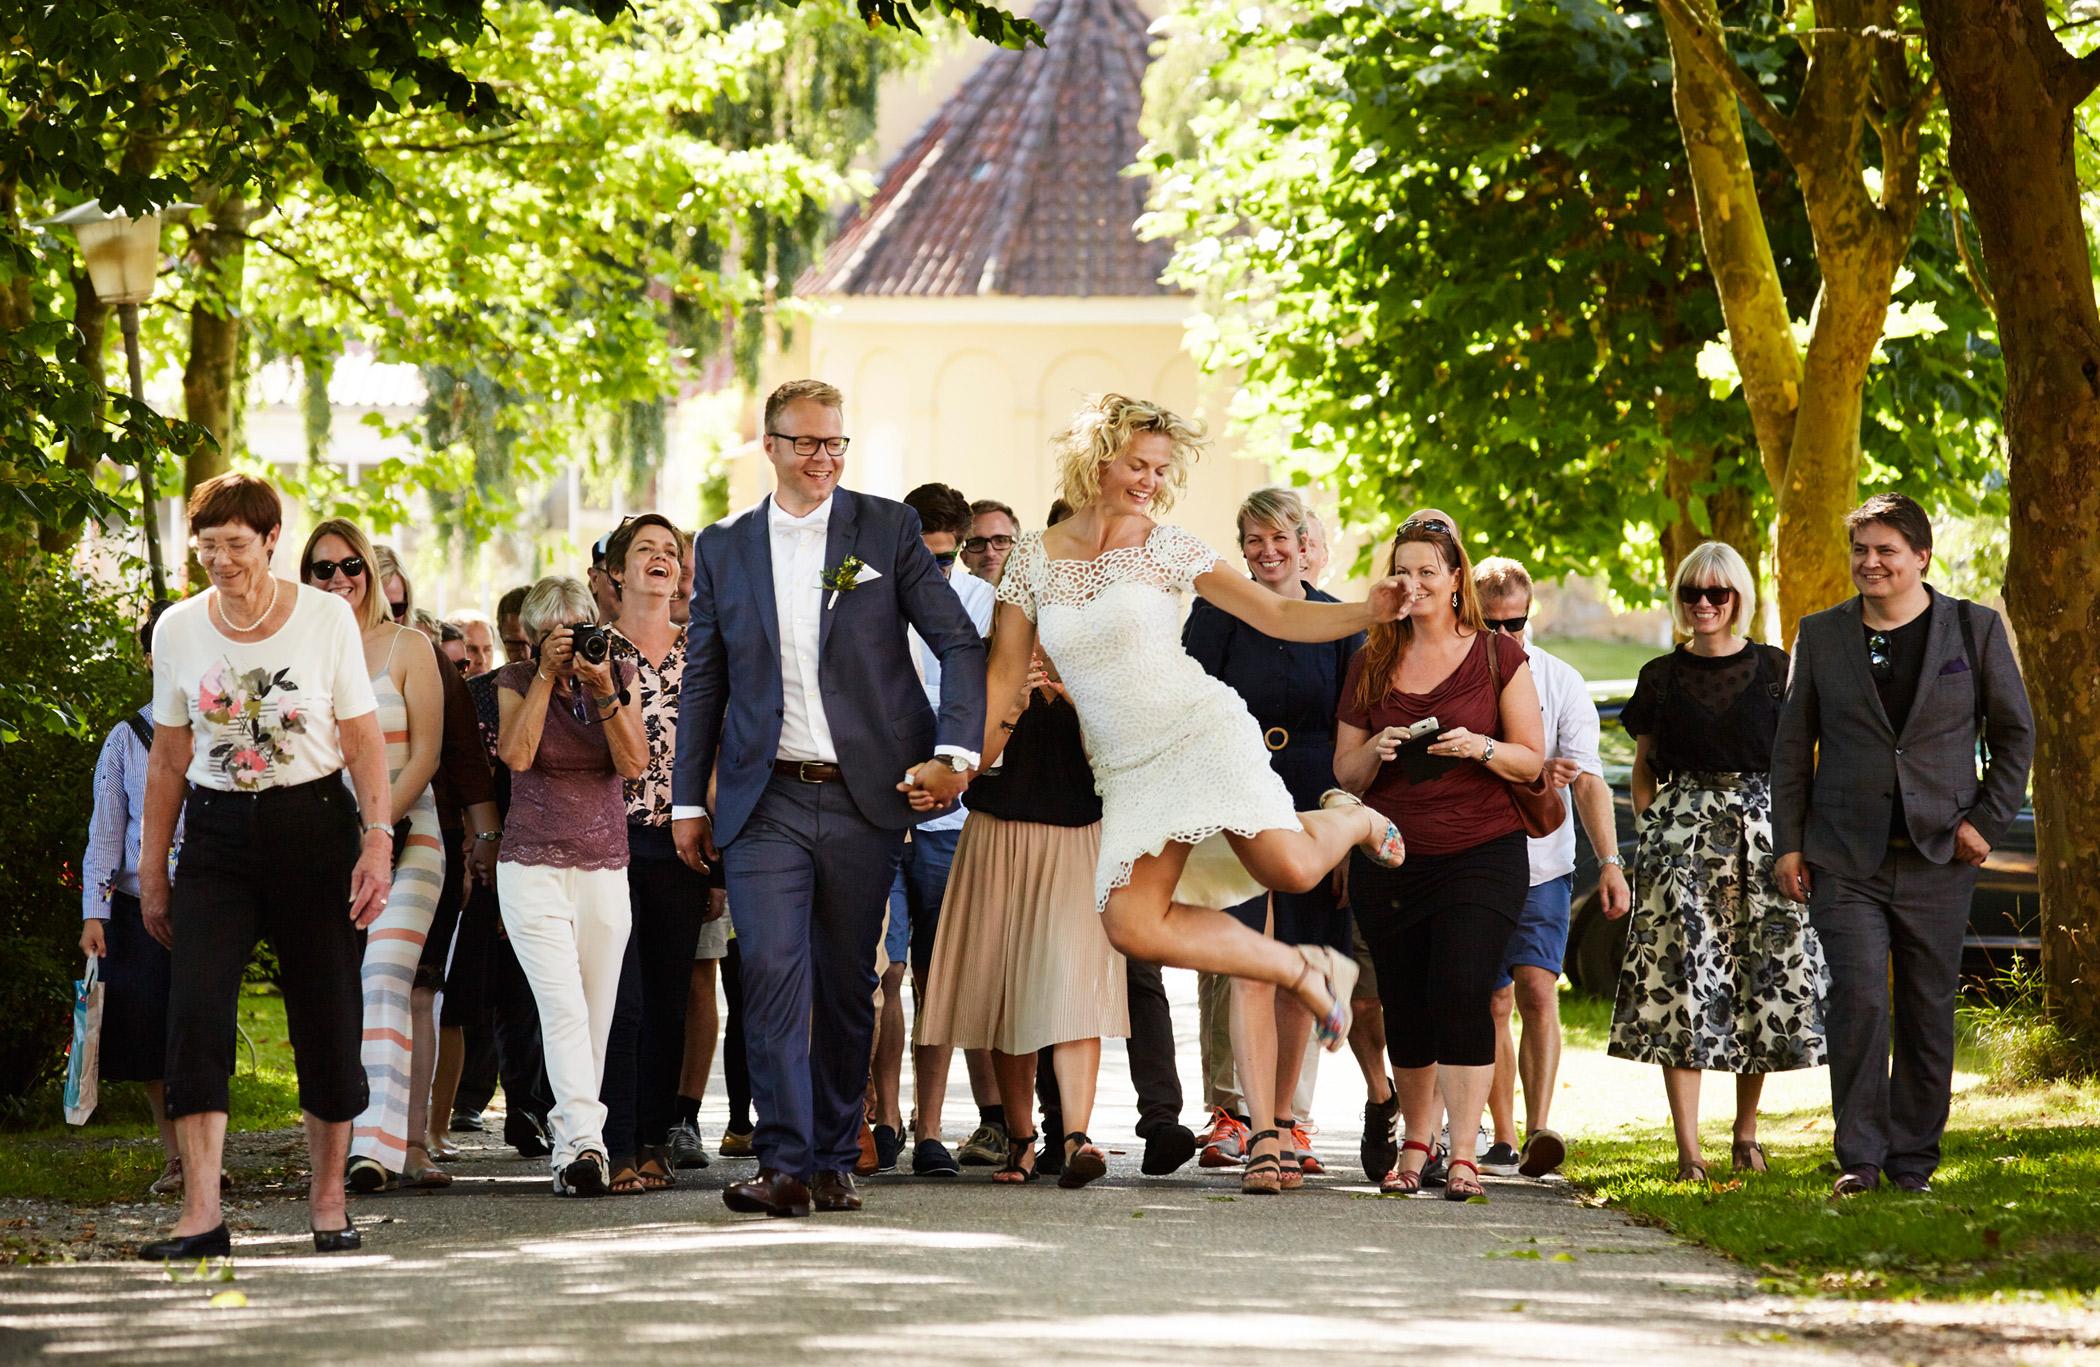 08_2016_bryllup_karenfrederik_V1802_WEB.jpg